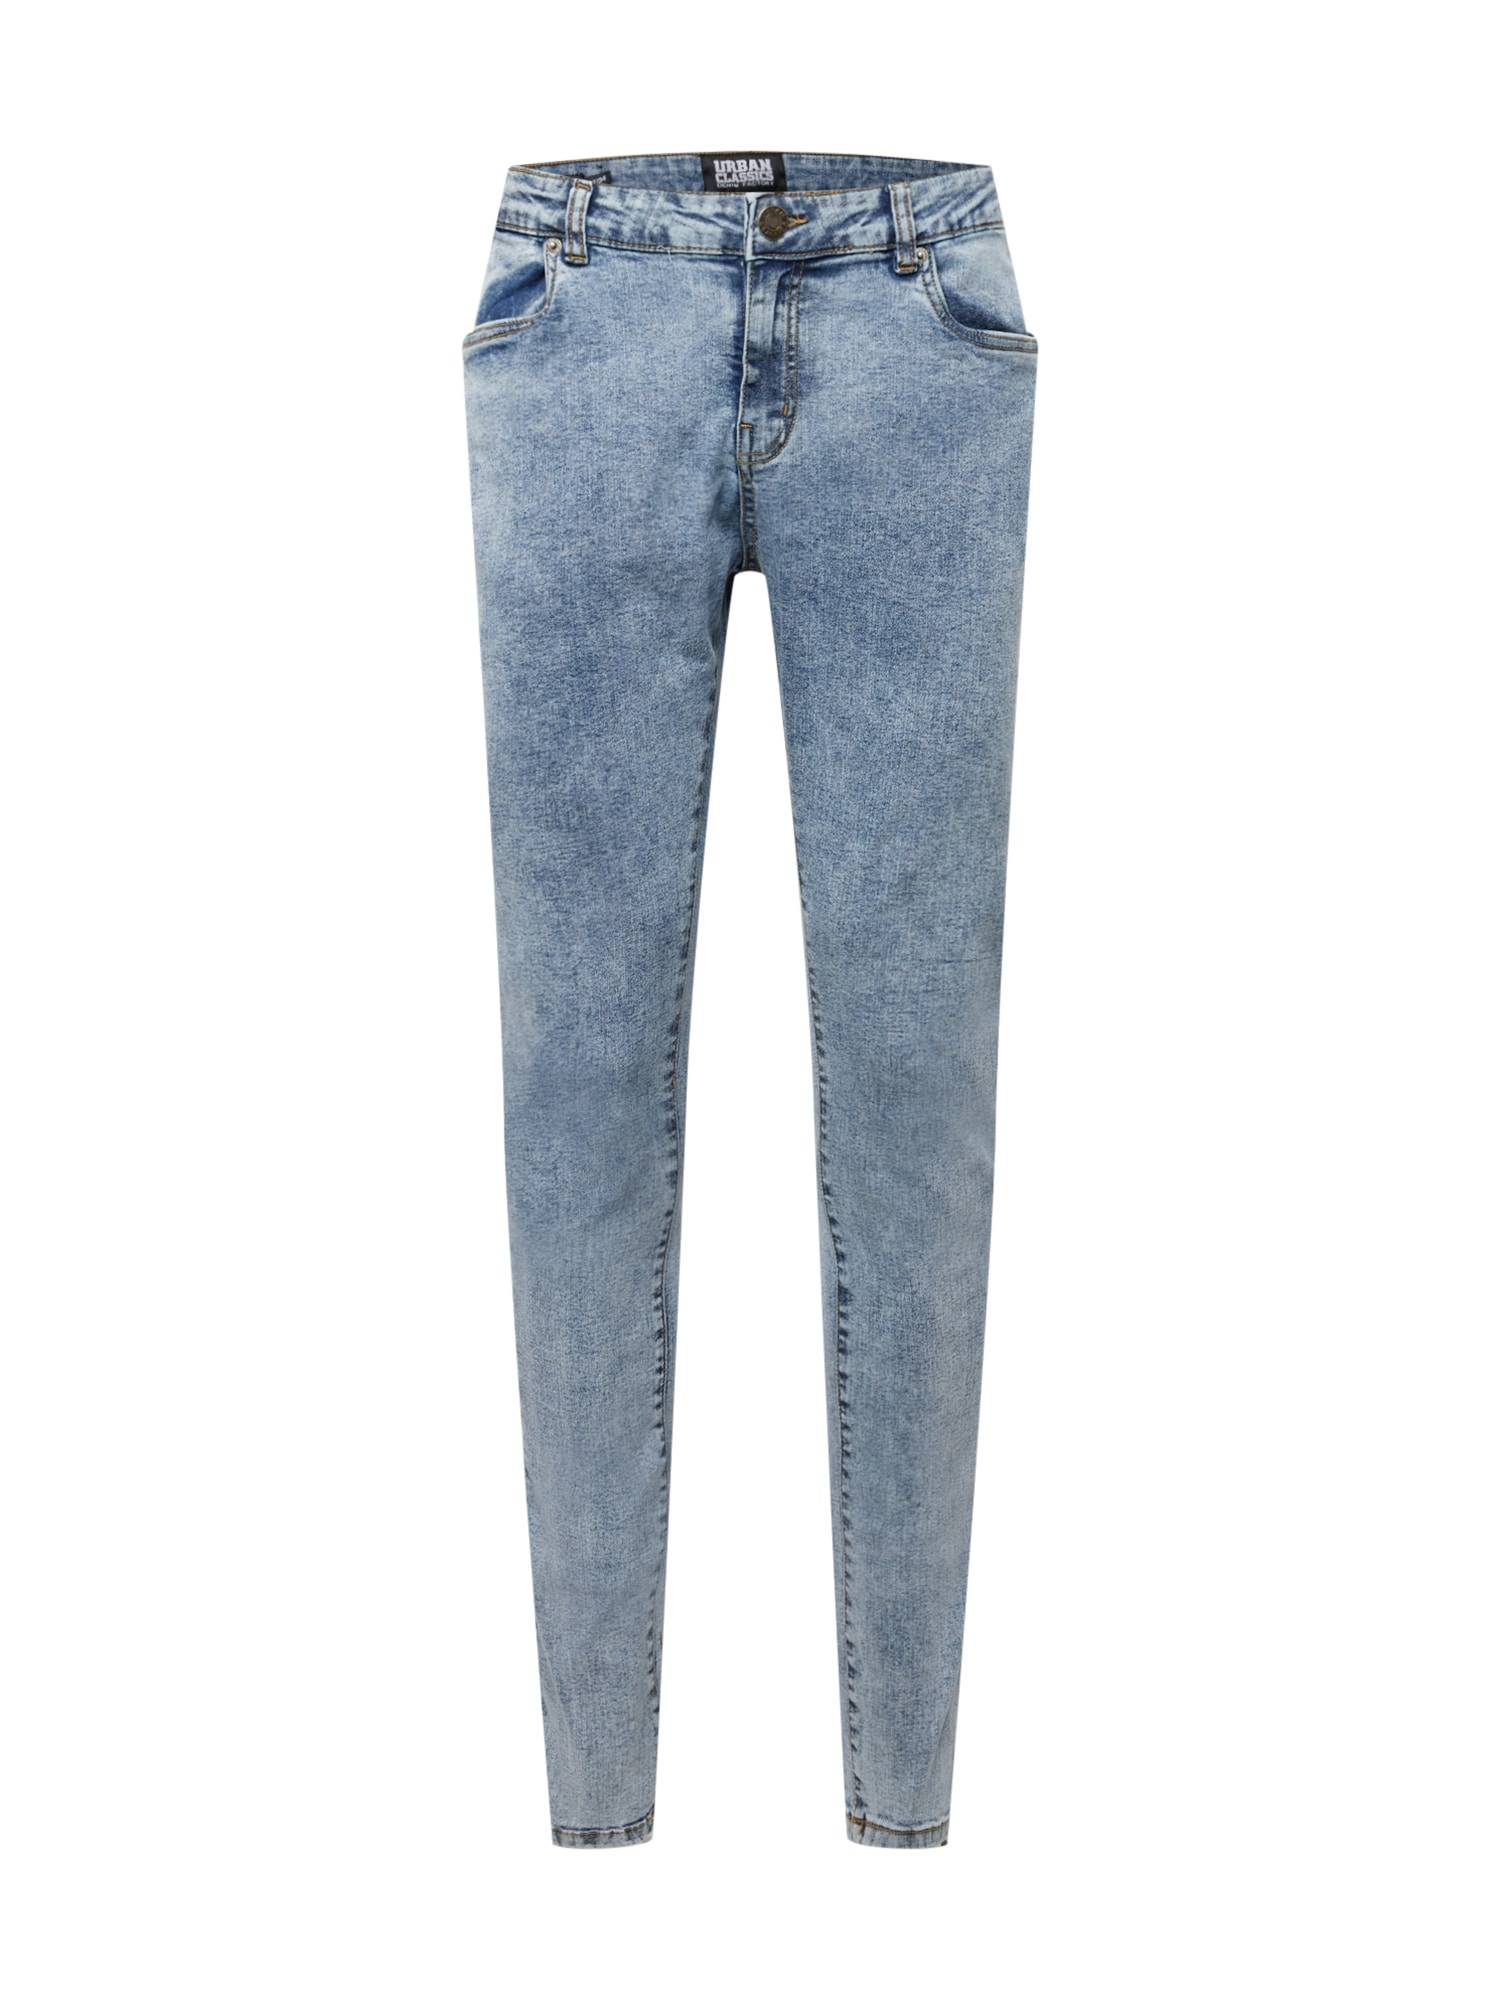 Urban Classics Plus Size Jean  - Bleu - Taille: 34 - male